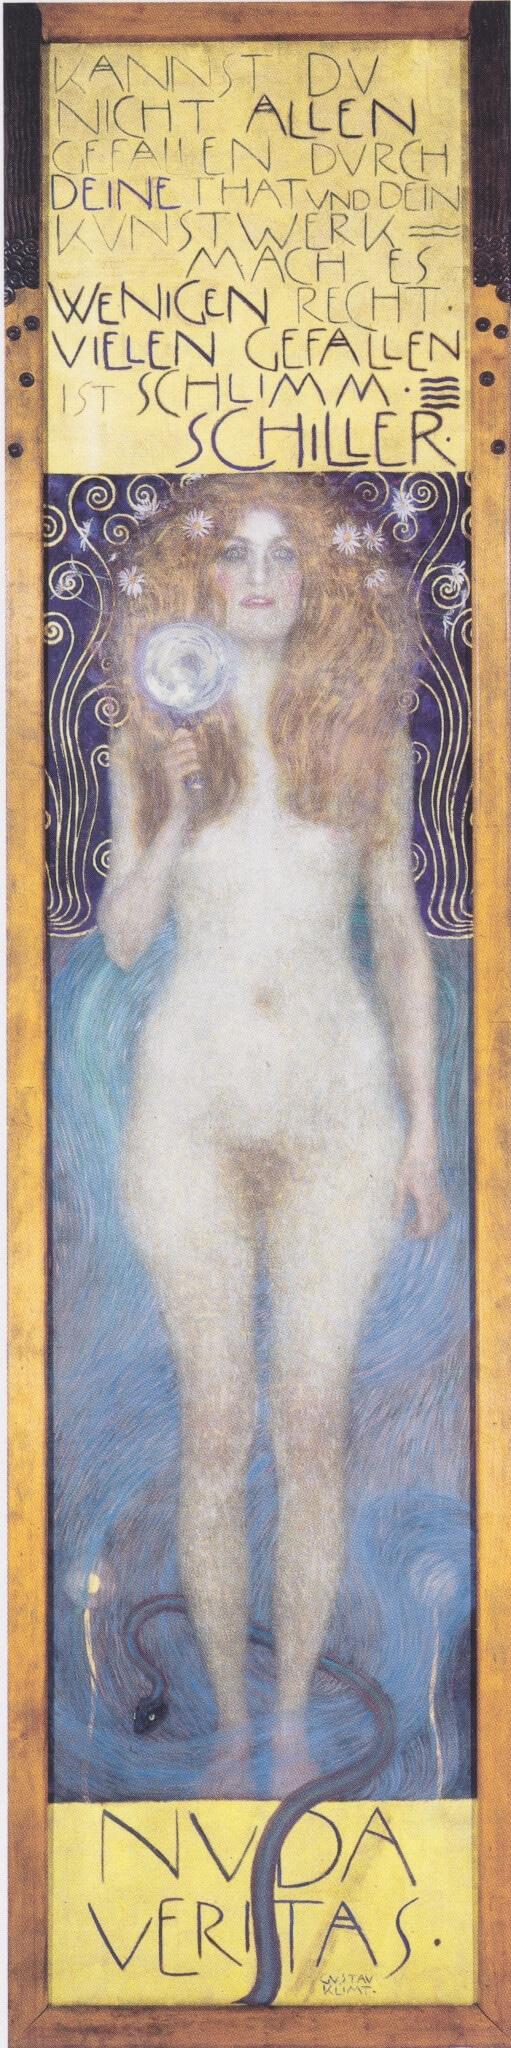 Gustave Klimt: Nuda Veritas